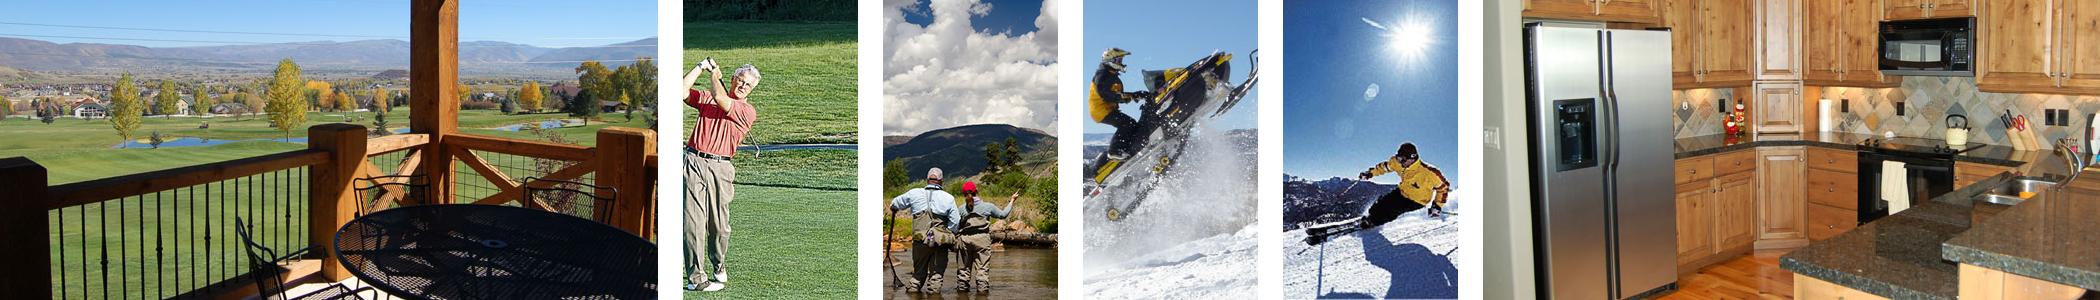 Midway Utah Vacation Rental